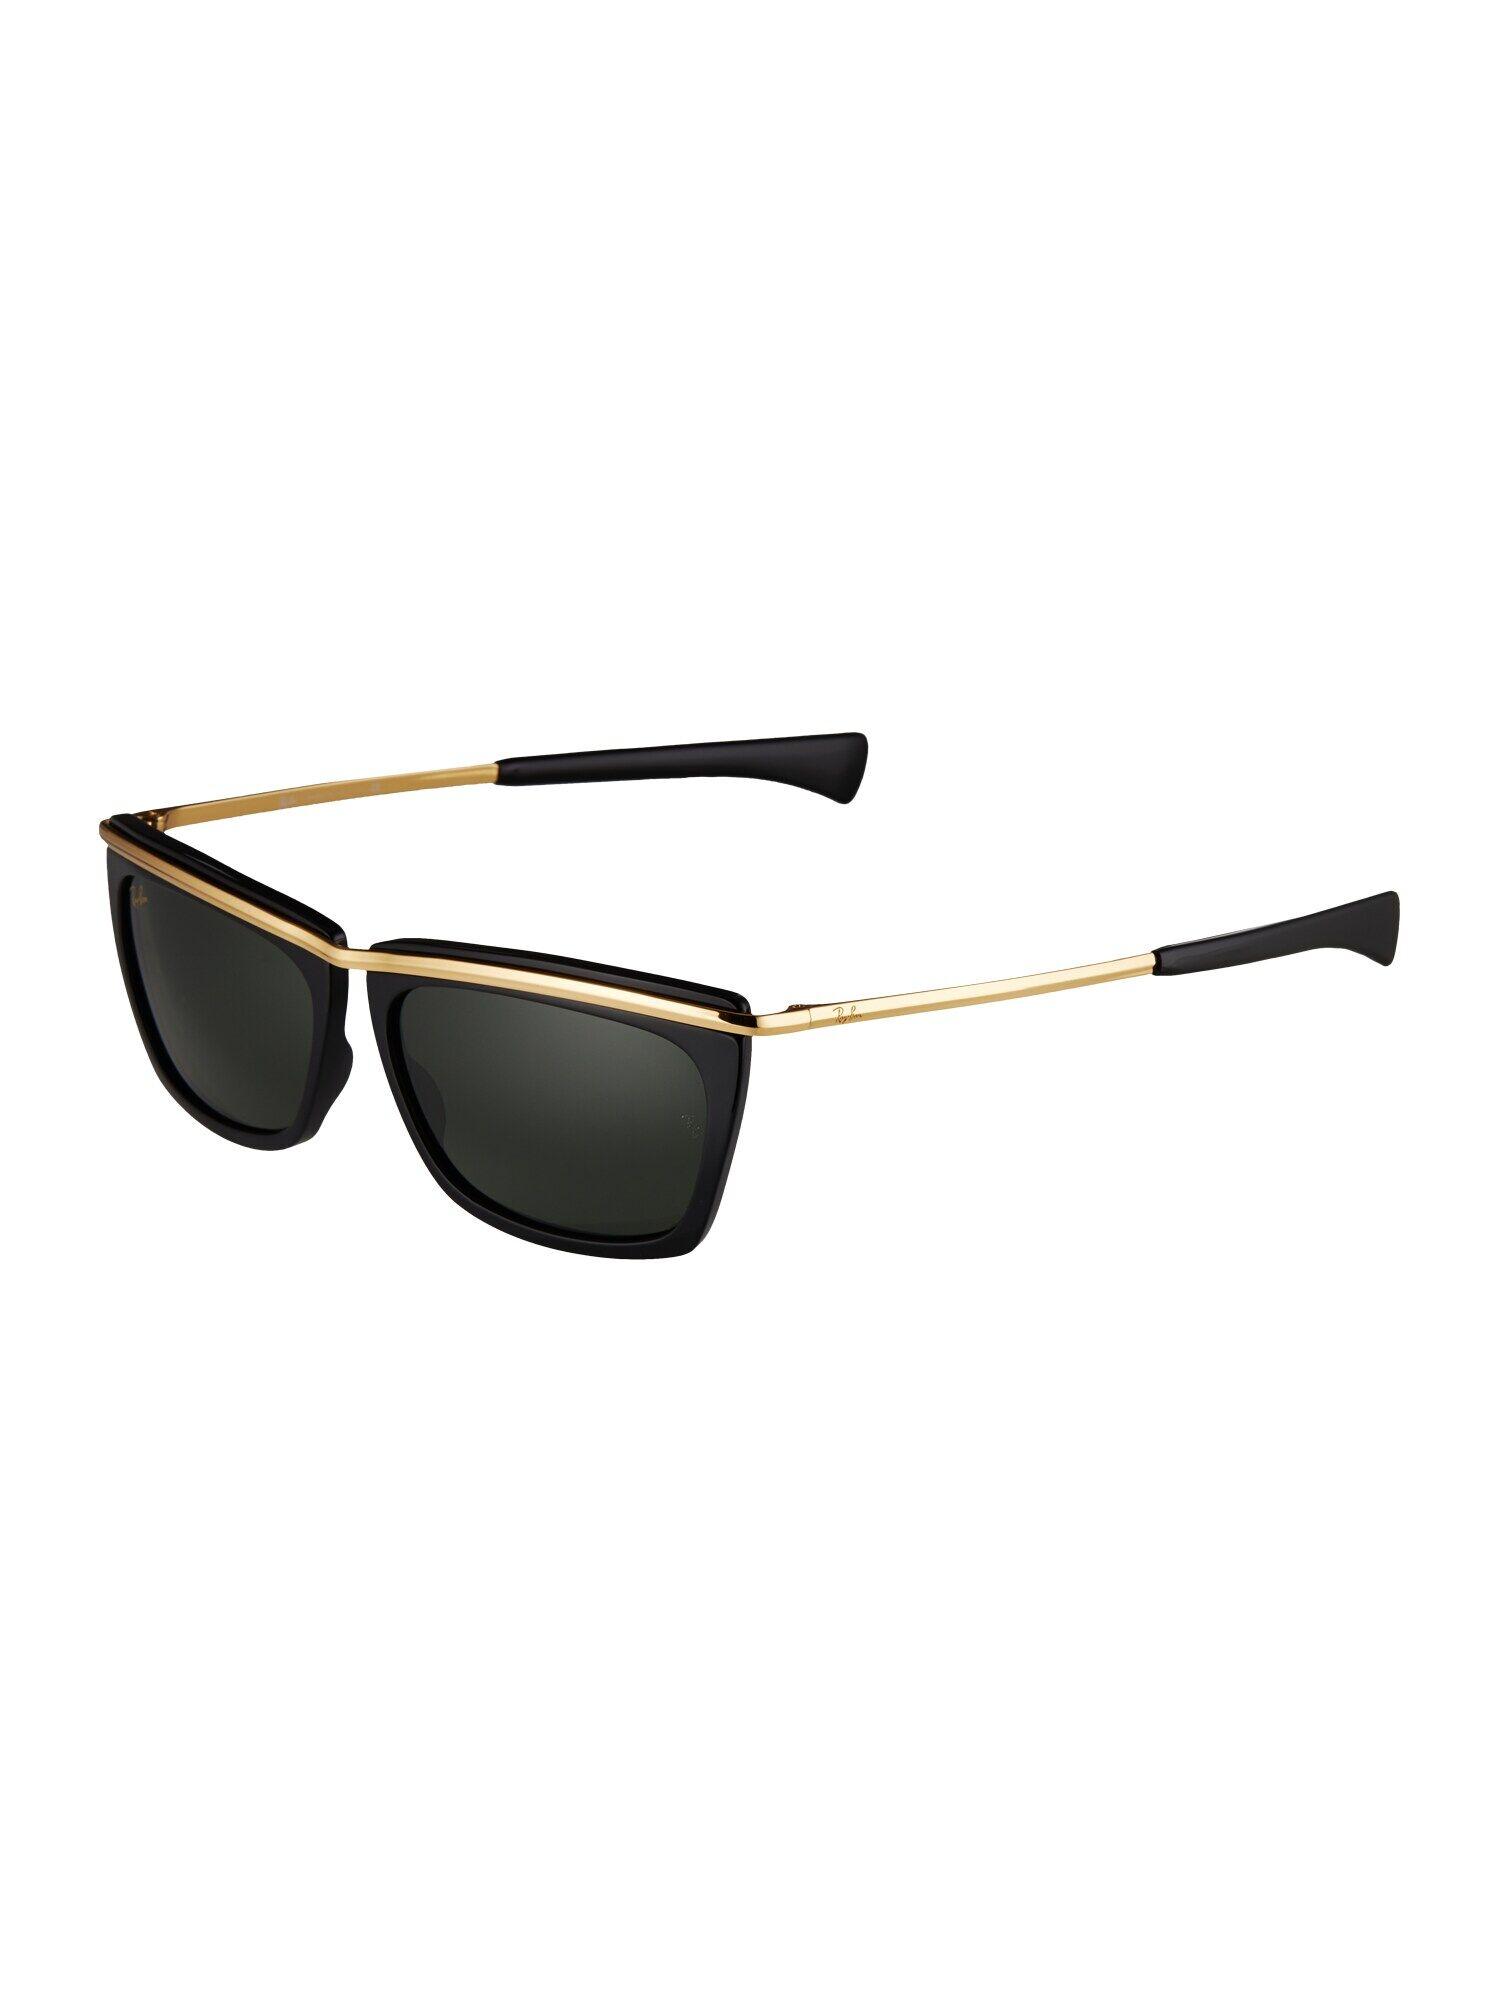 ray-ban occhiali da sole 'olympian ii' nero